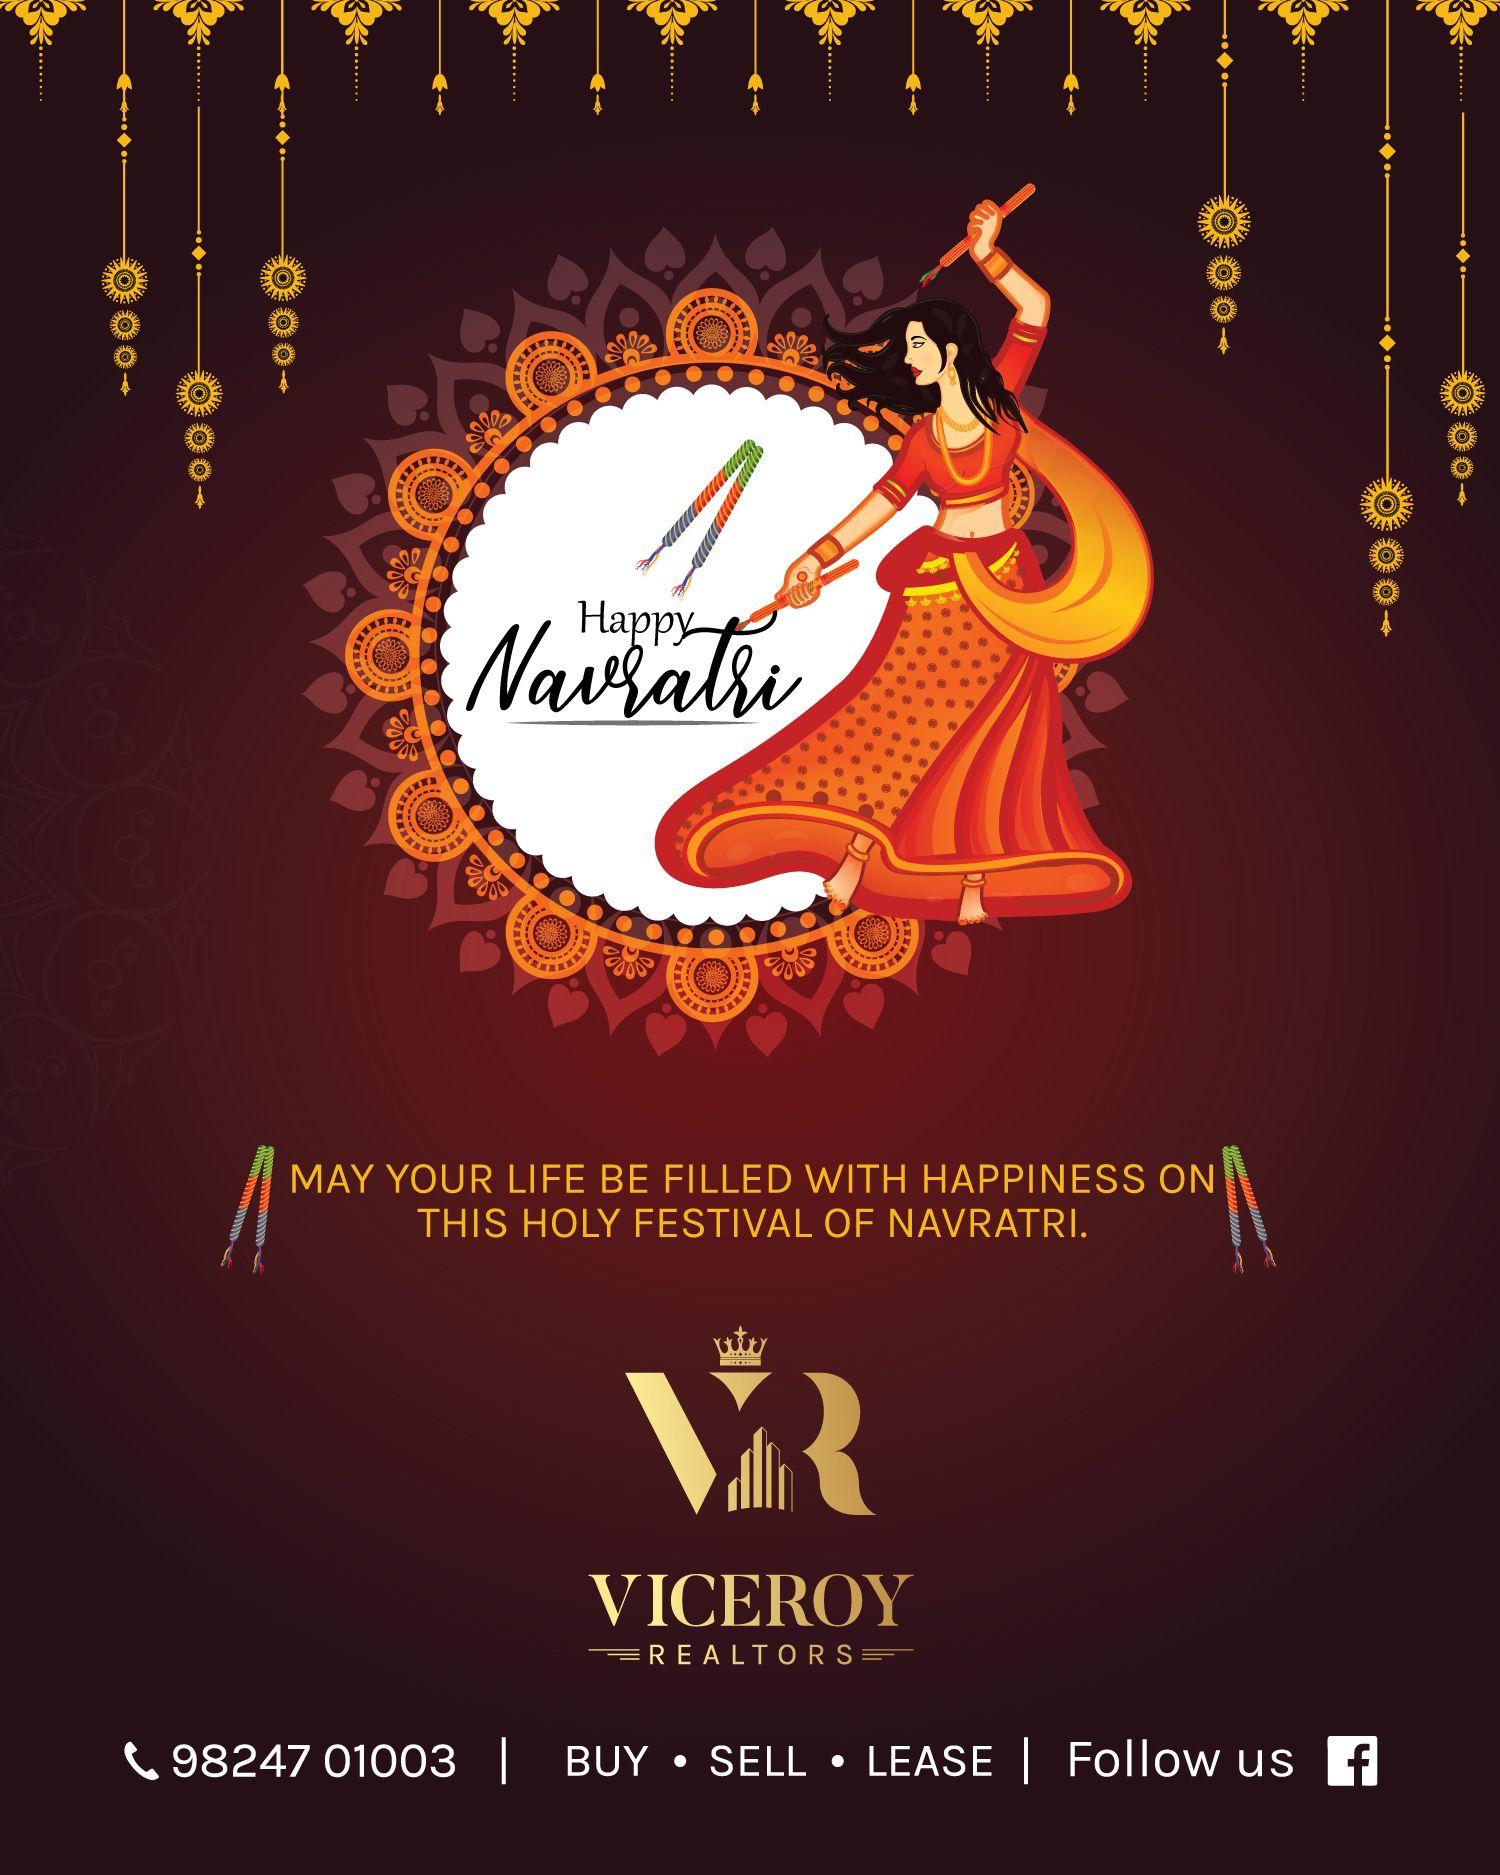 नवरात्रि की हार्दिक शुभकामनाएं Greeting card designed for Real Estate Agent #navratriwishes